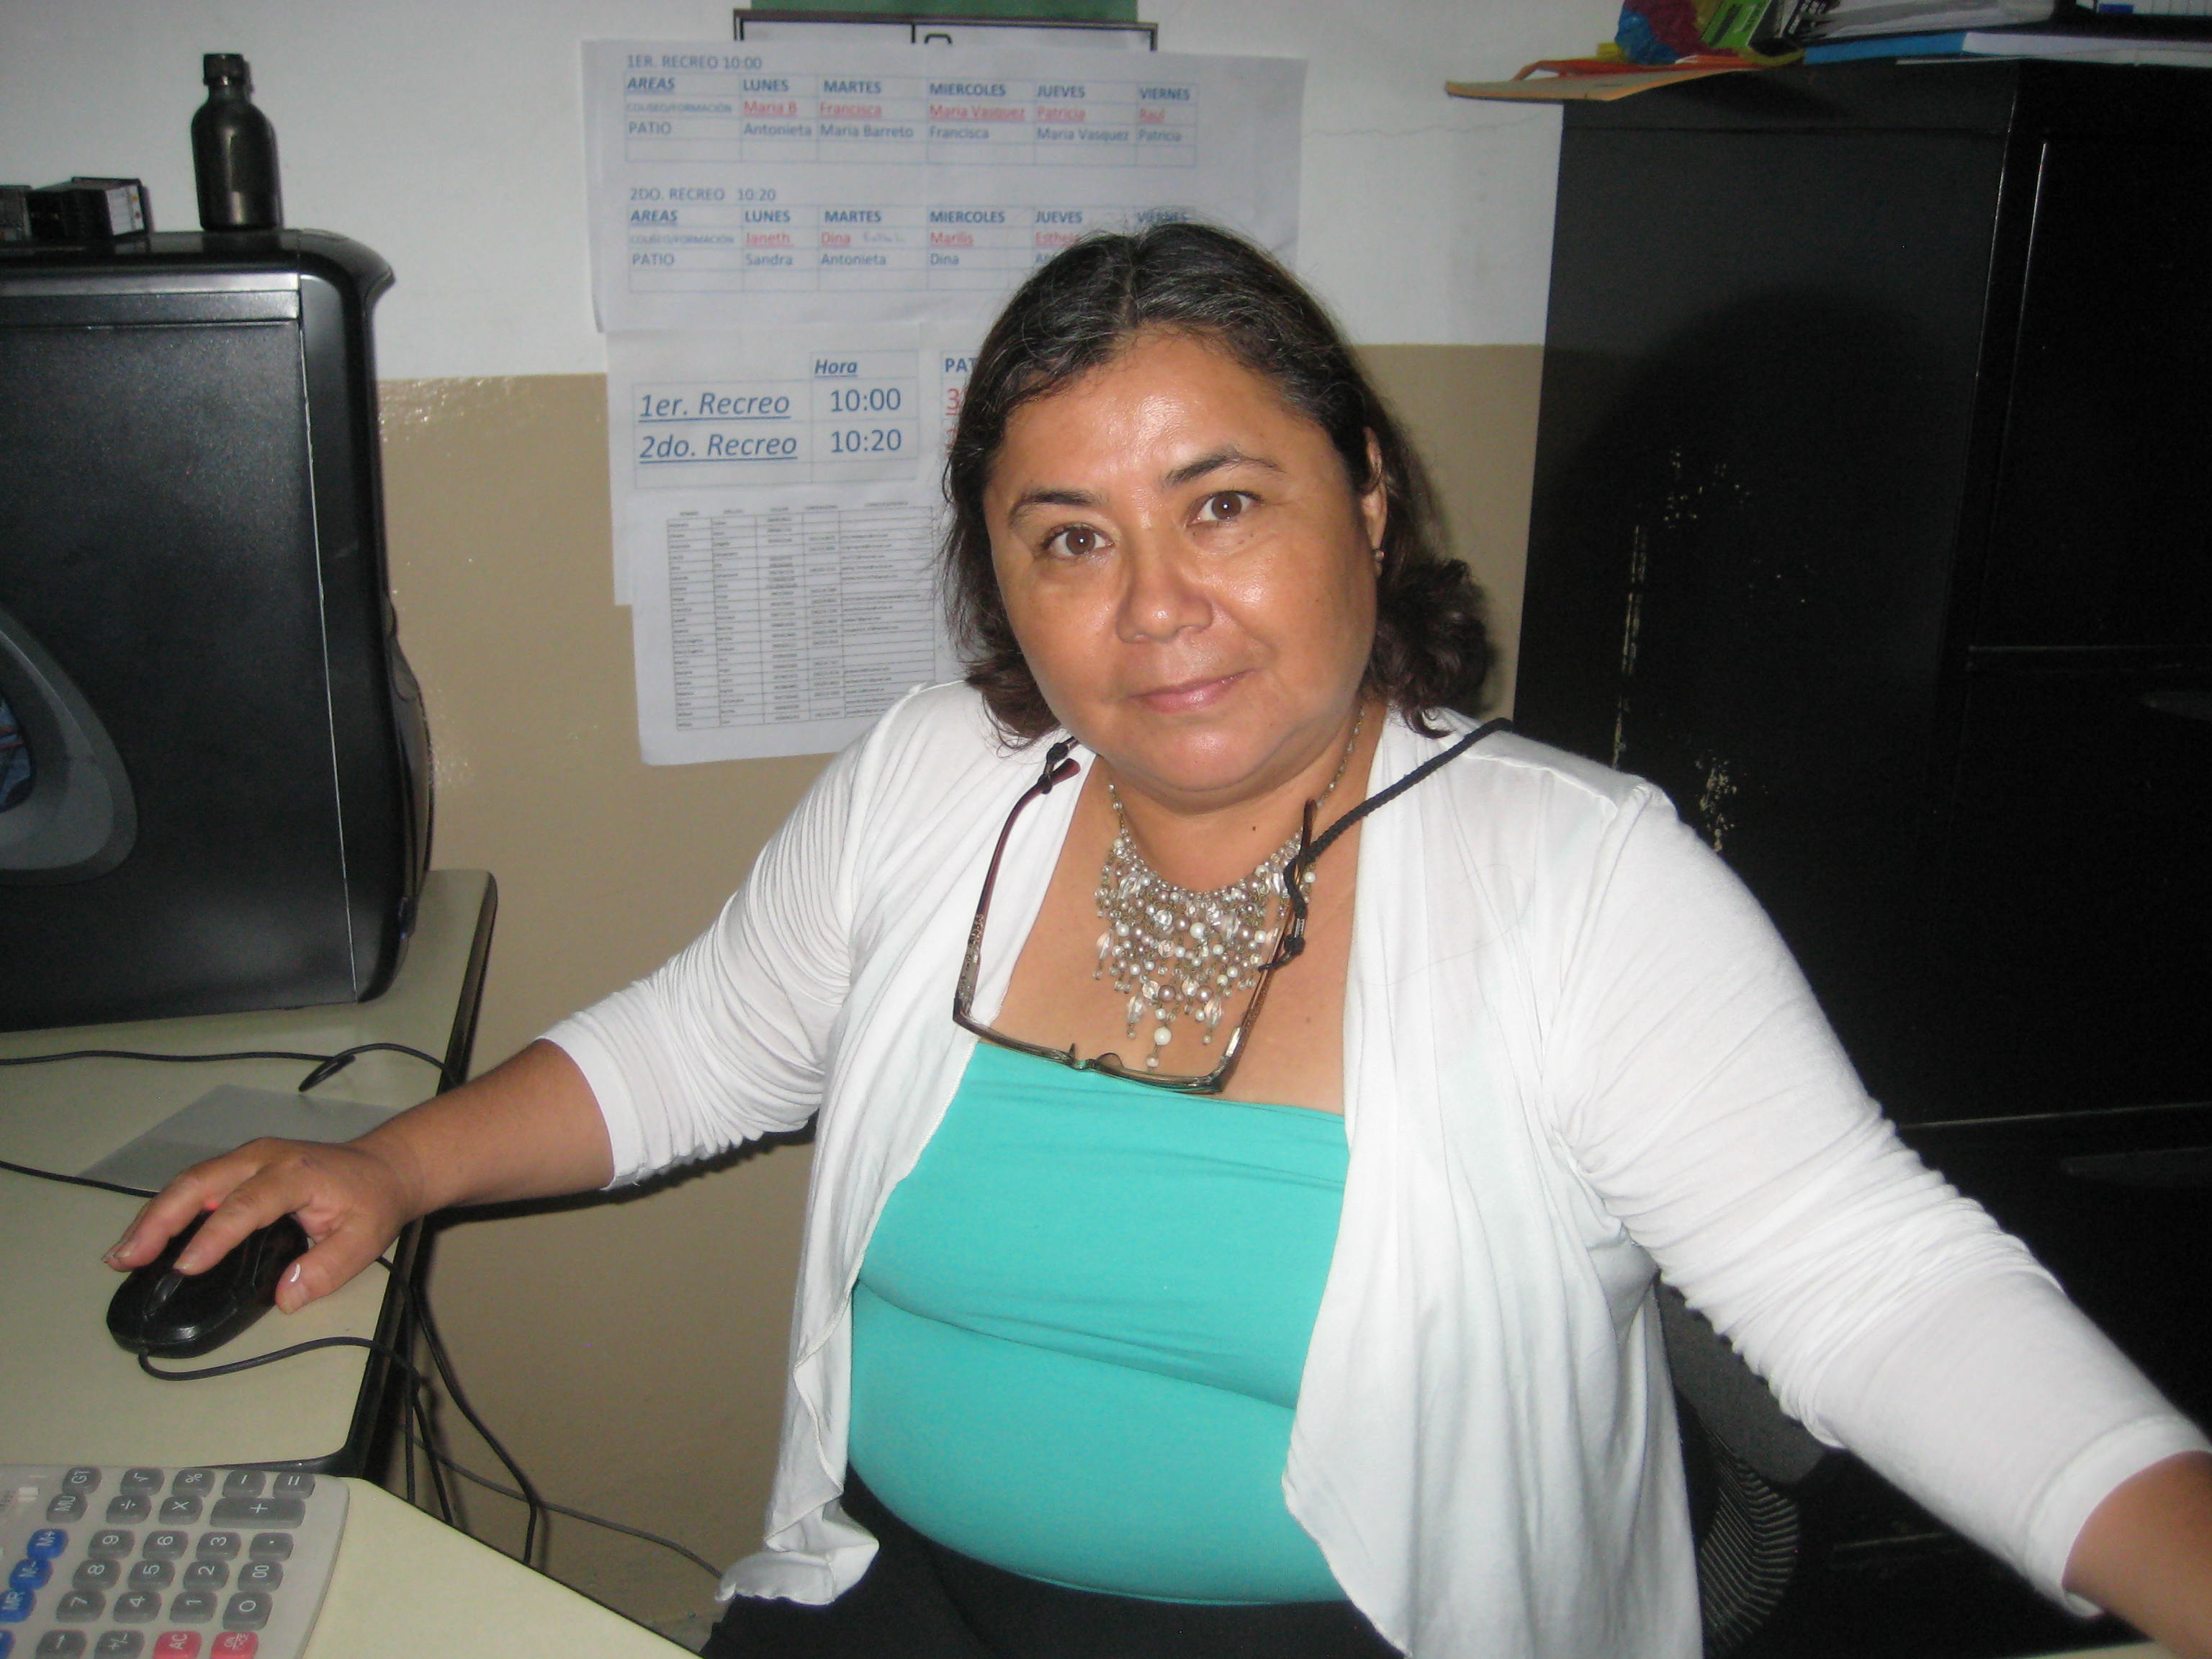 Sandra Camposano